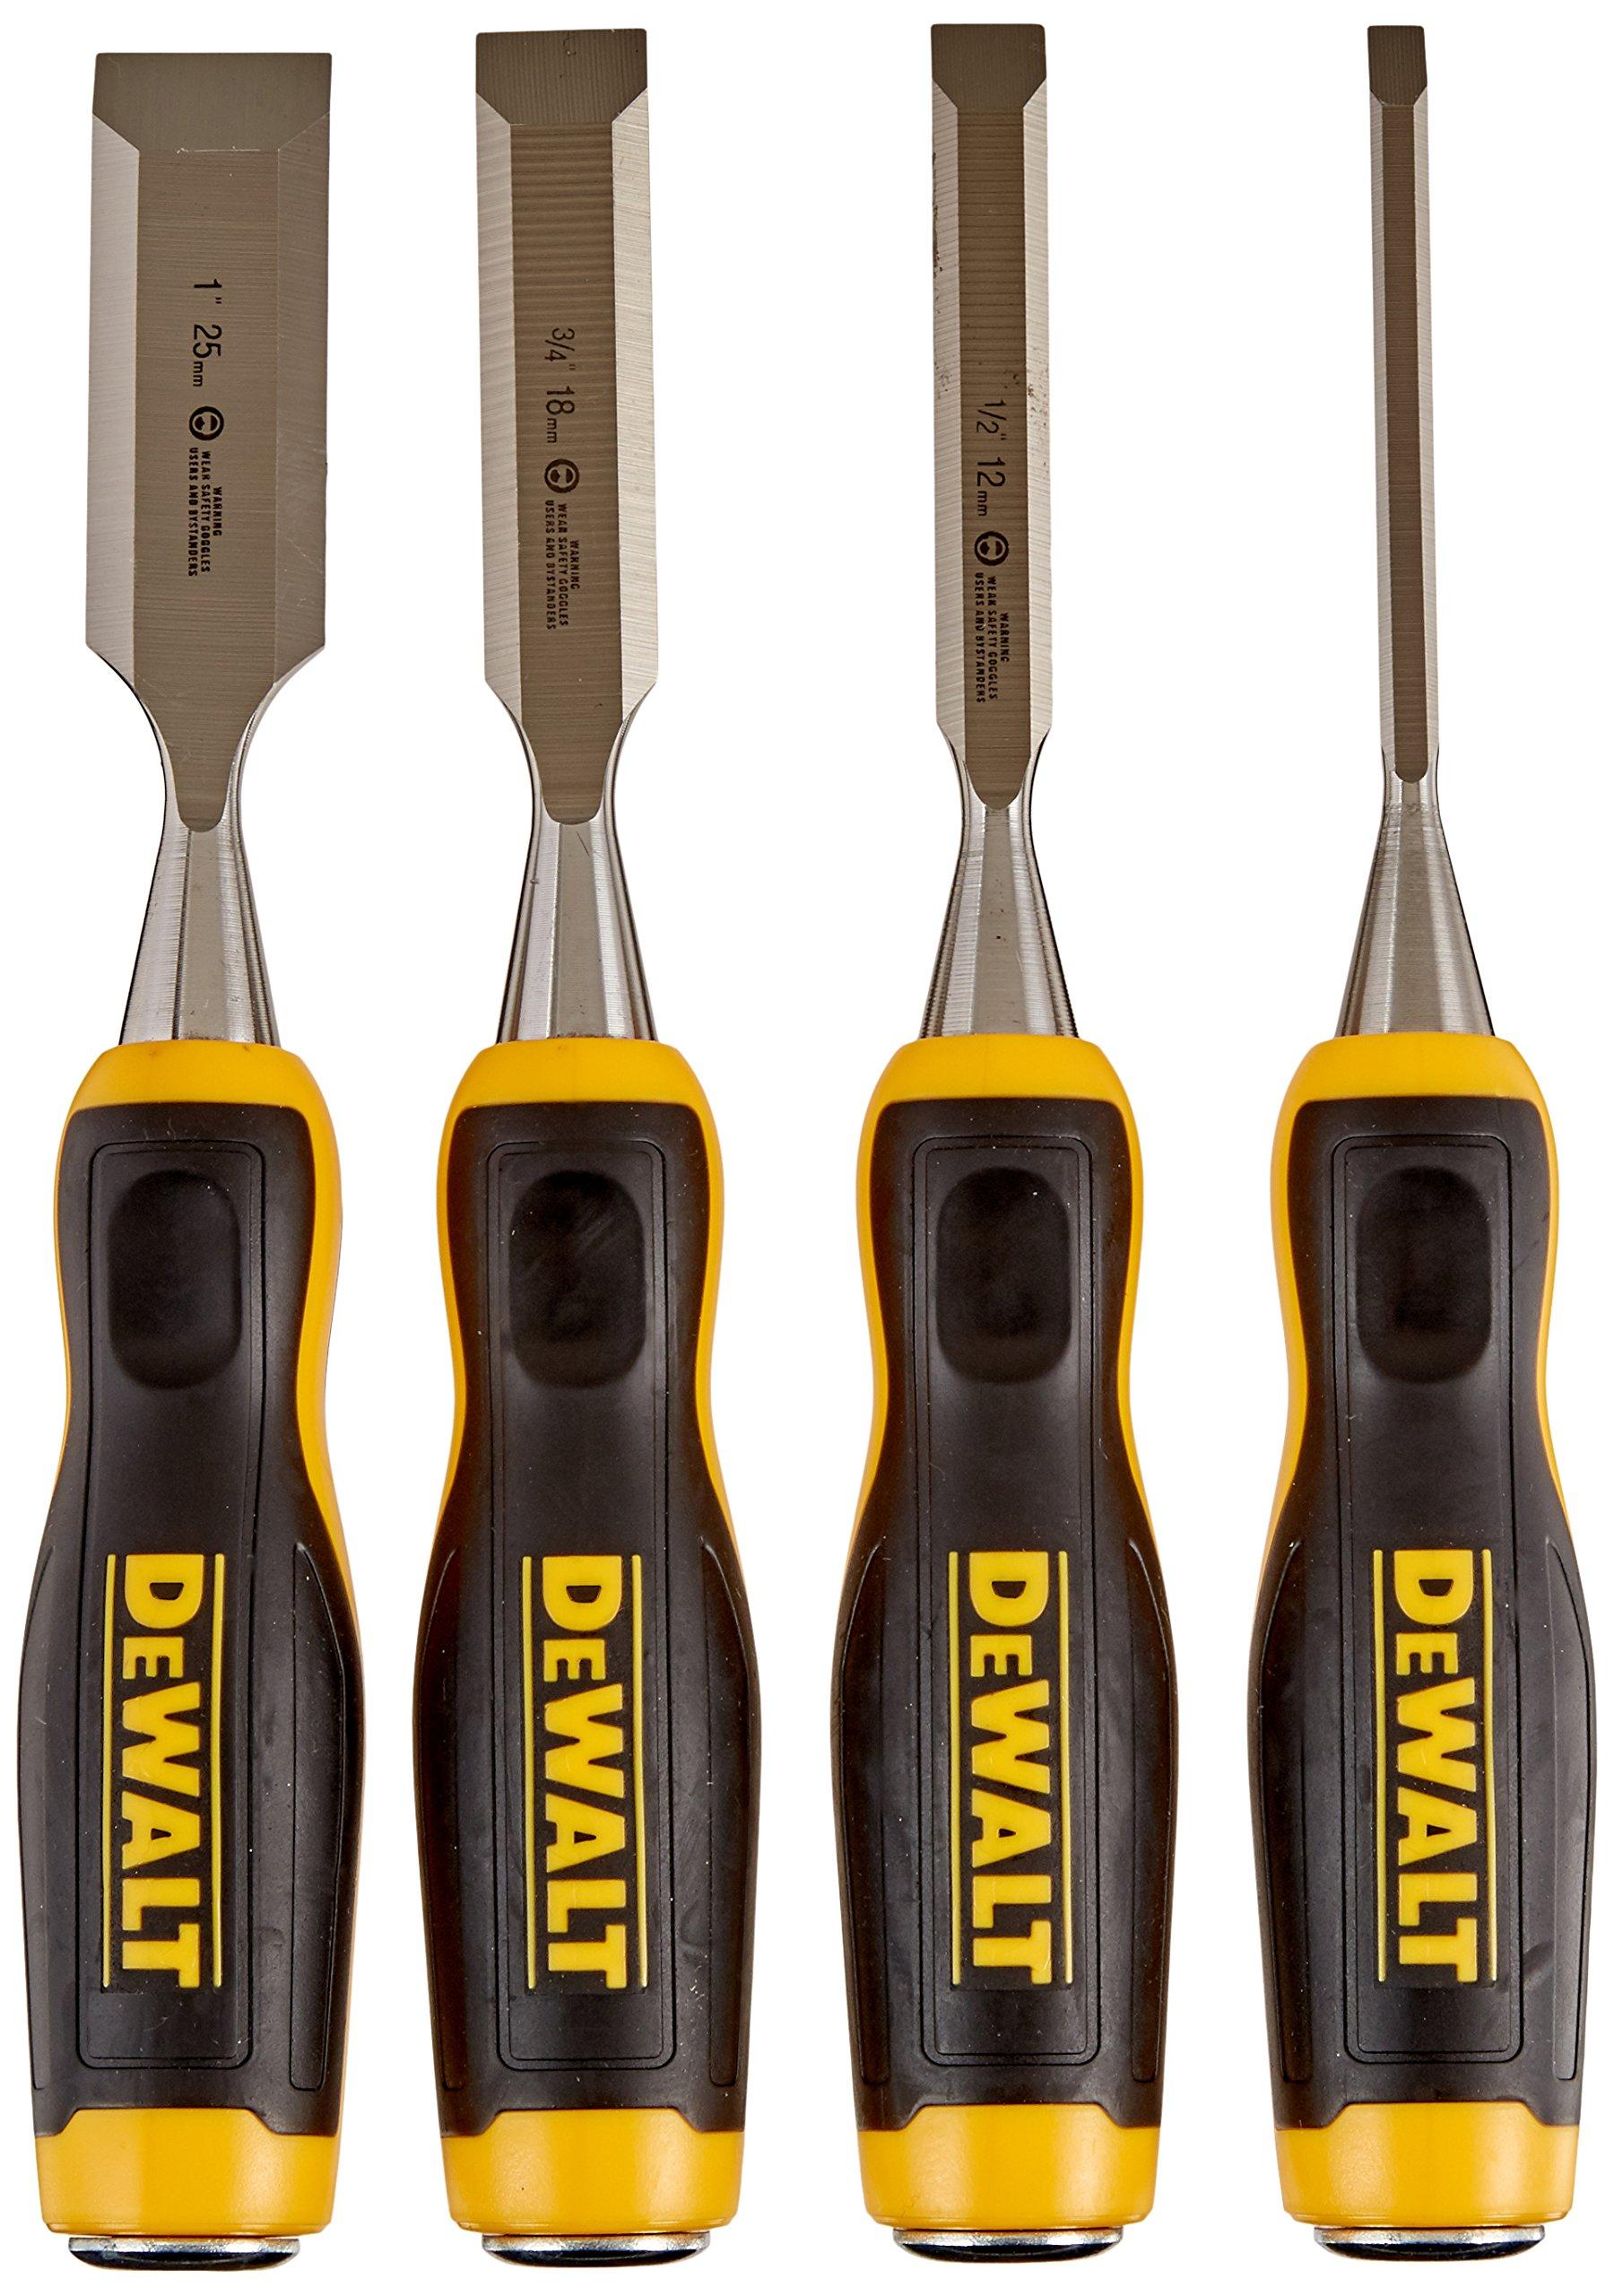 DEWALT DWHT16063 Short Blade Wood Chisel 4piece set